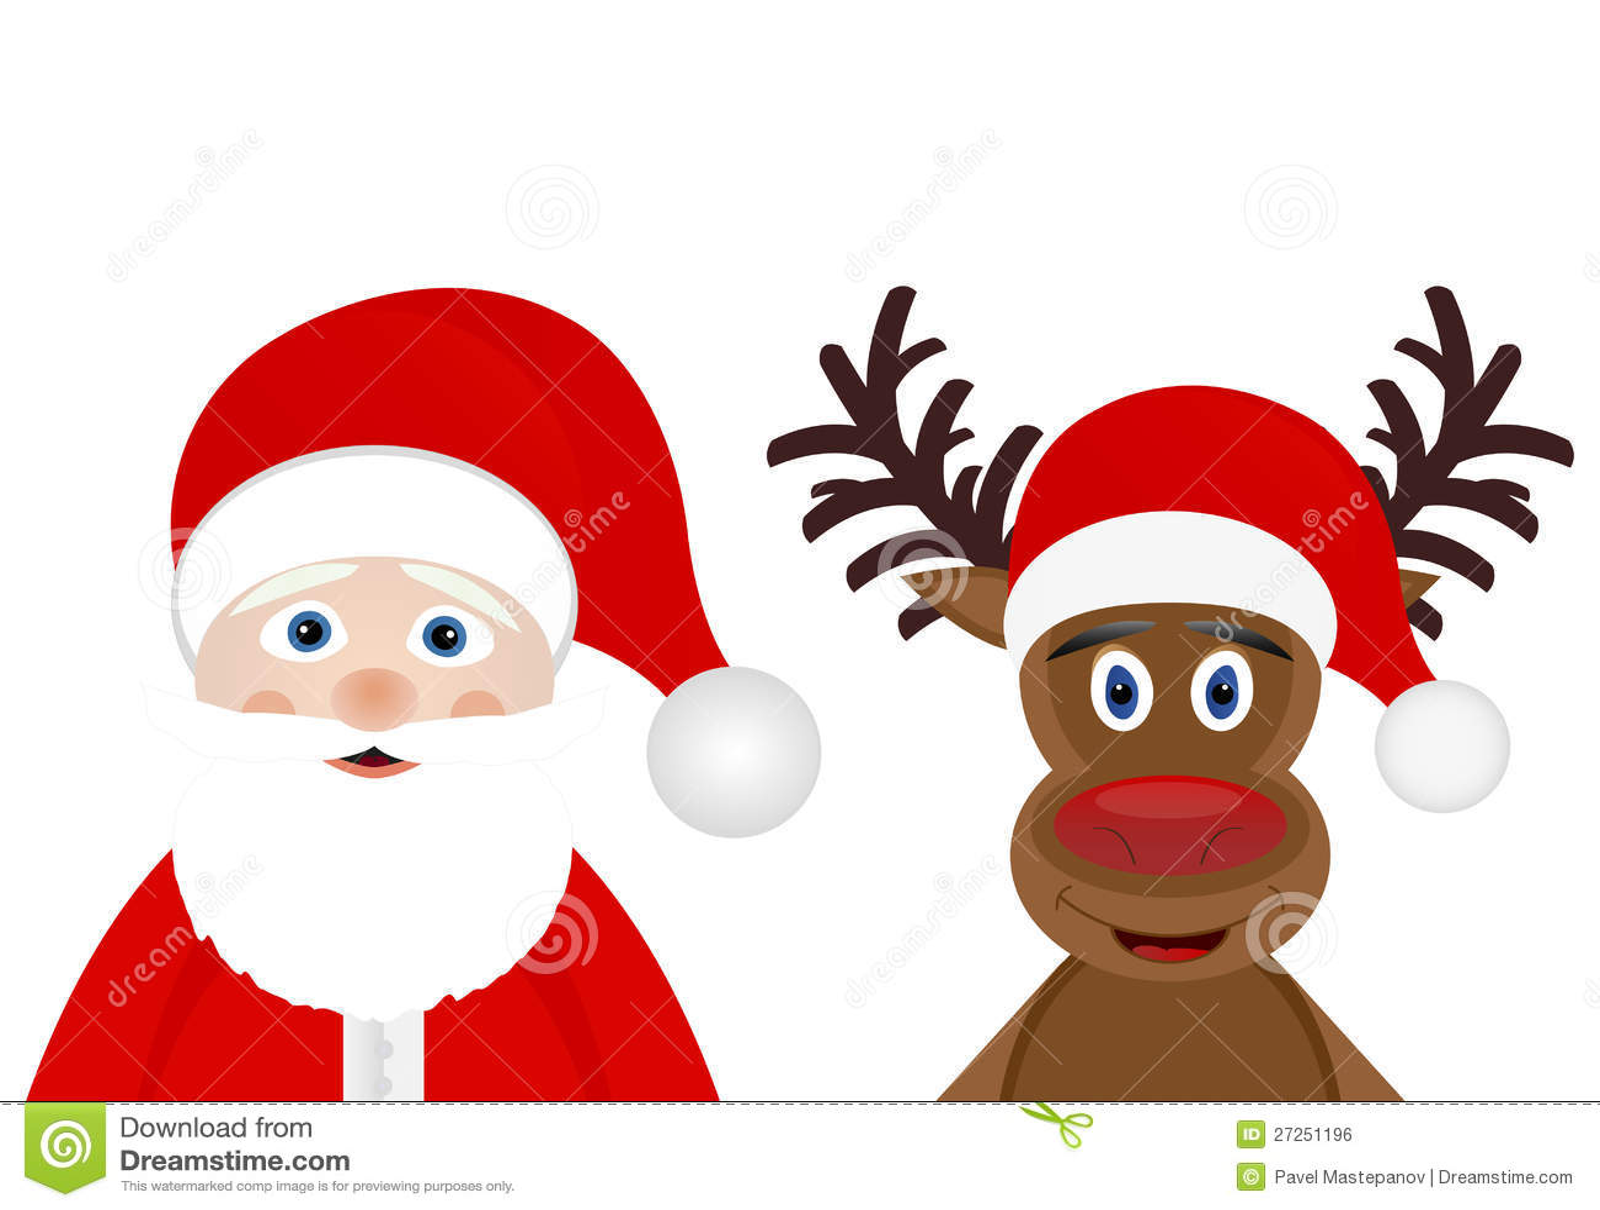 santa claus and christmas deer - Santa Claus Christmas